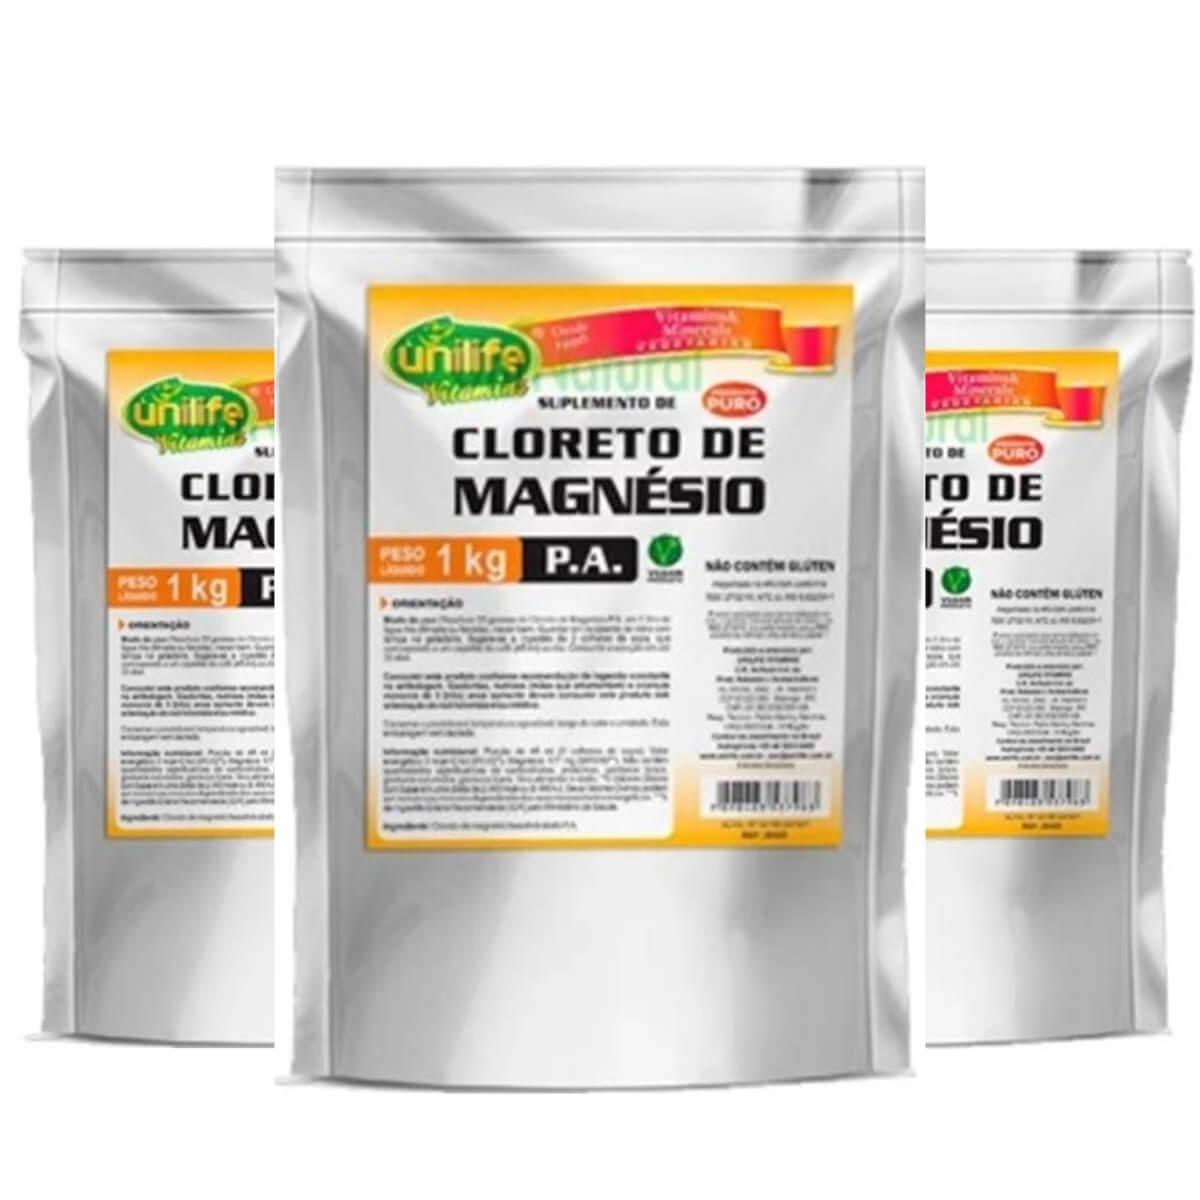 1ffbe3850 3x Cloreto De Magnésio Pa Puro 1Kg Unilife